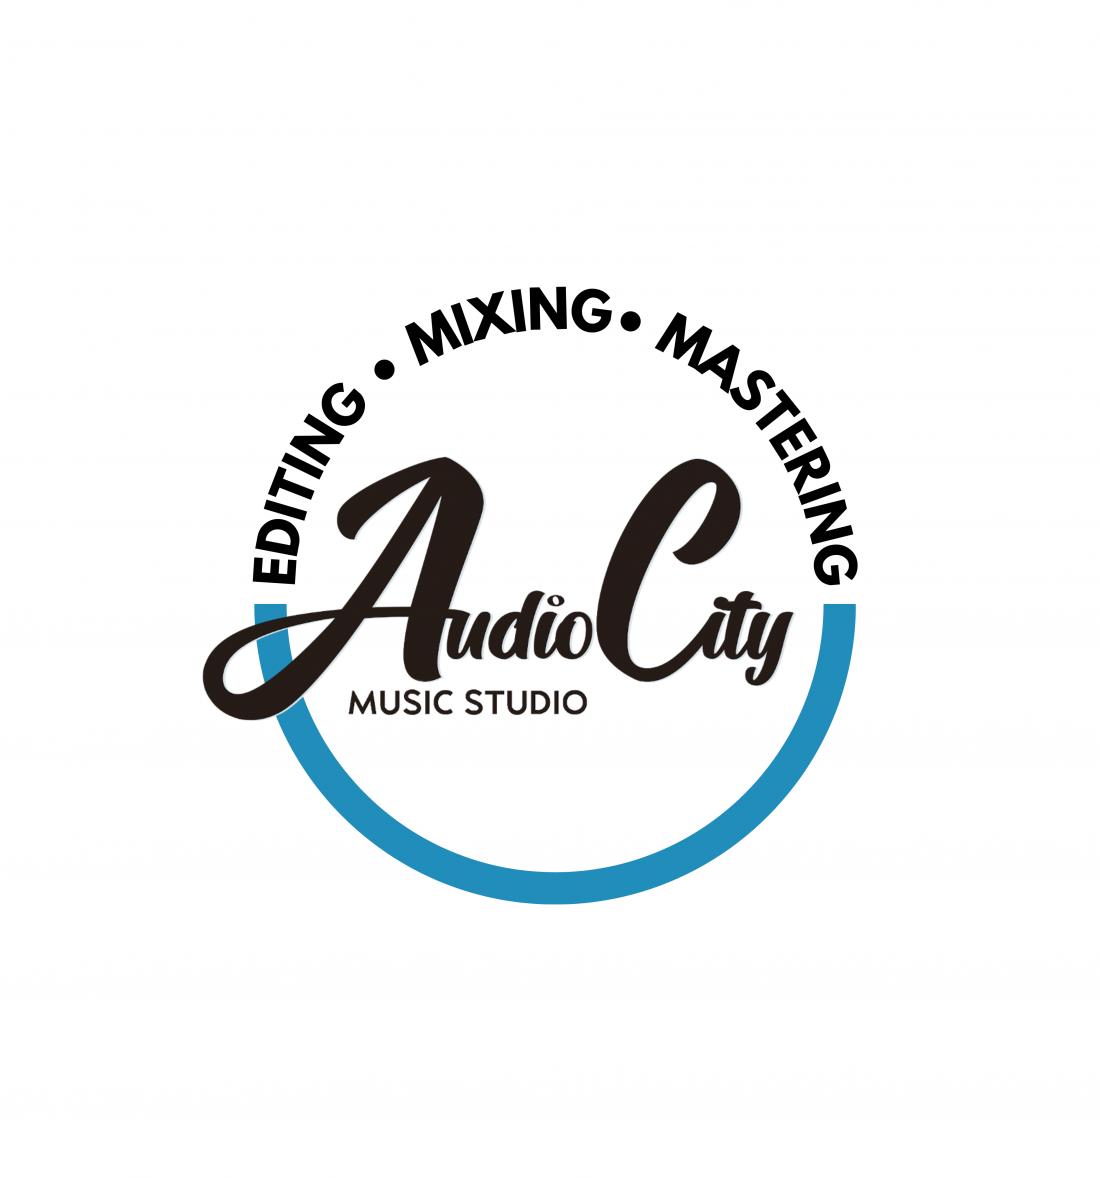 AUDIOCITY Music Studio